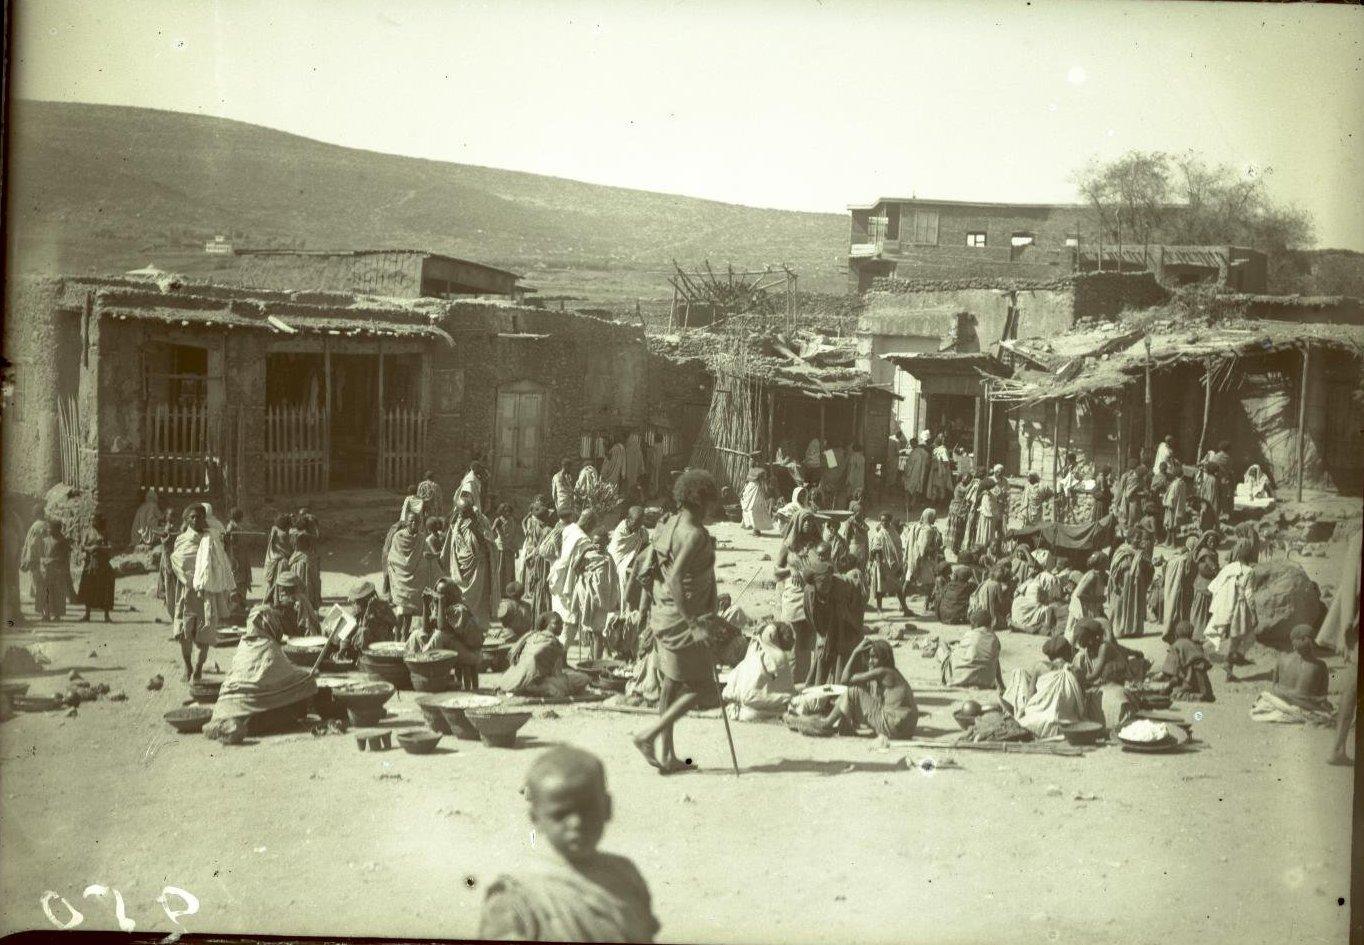 250. Абиссиния, провинция Харар, г. Харар. На базаре